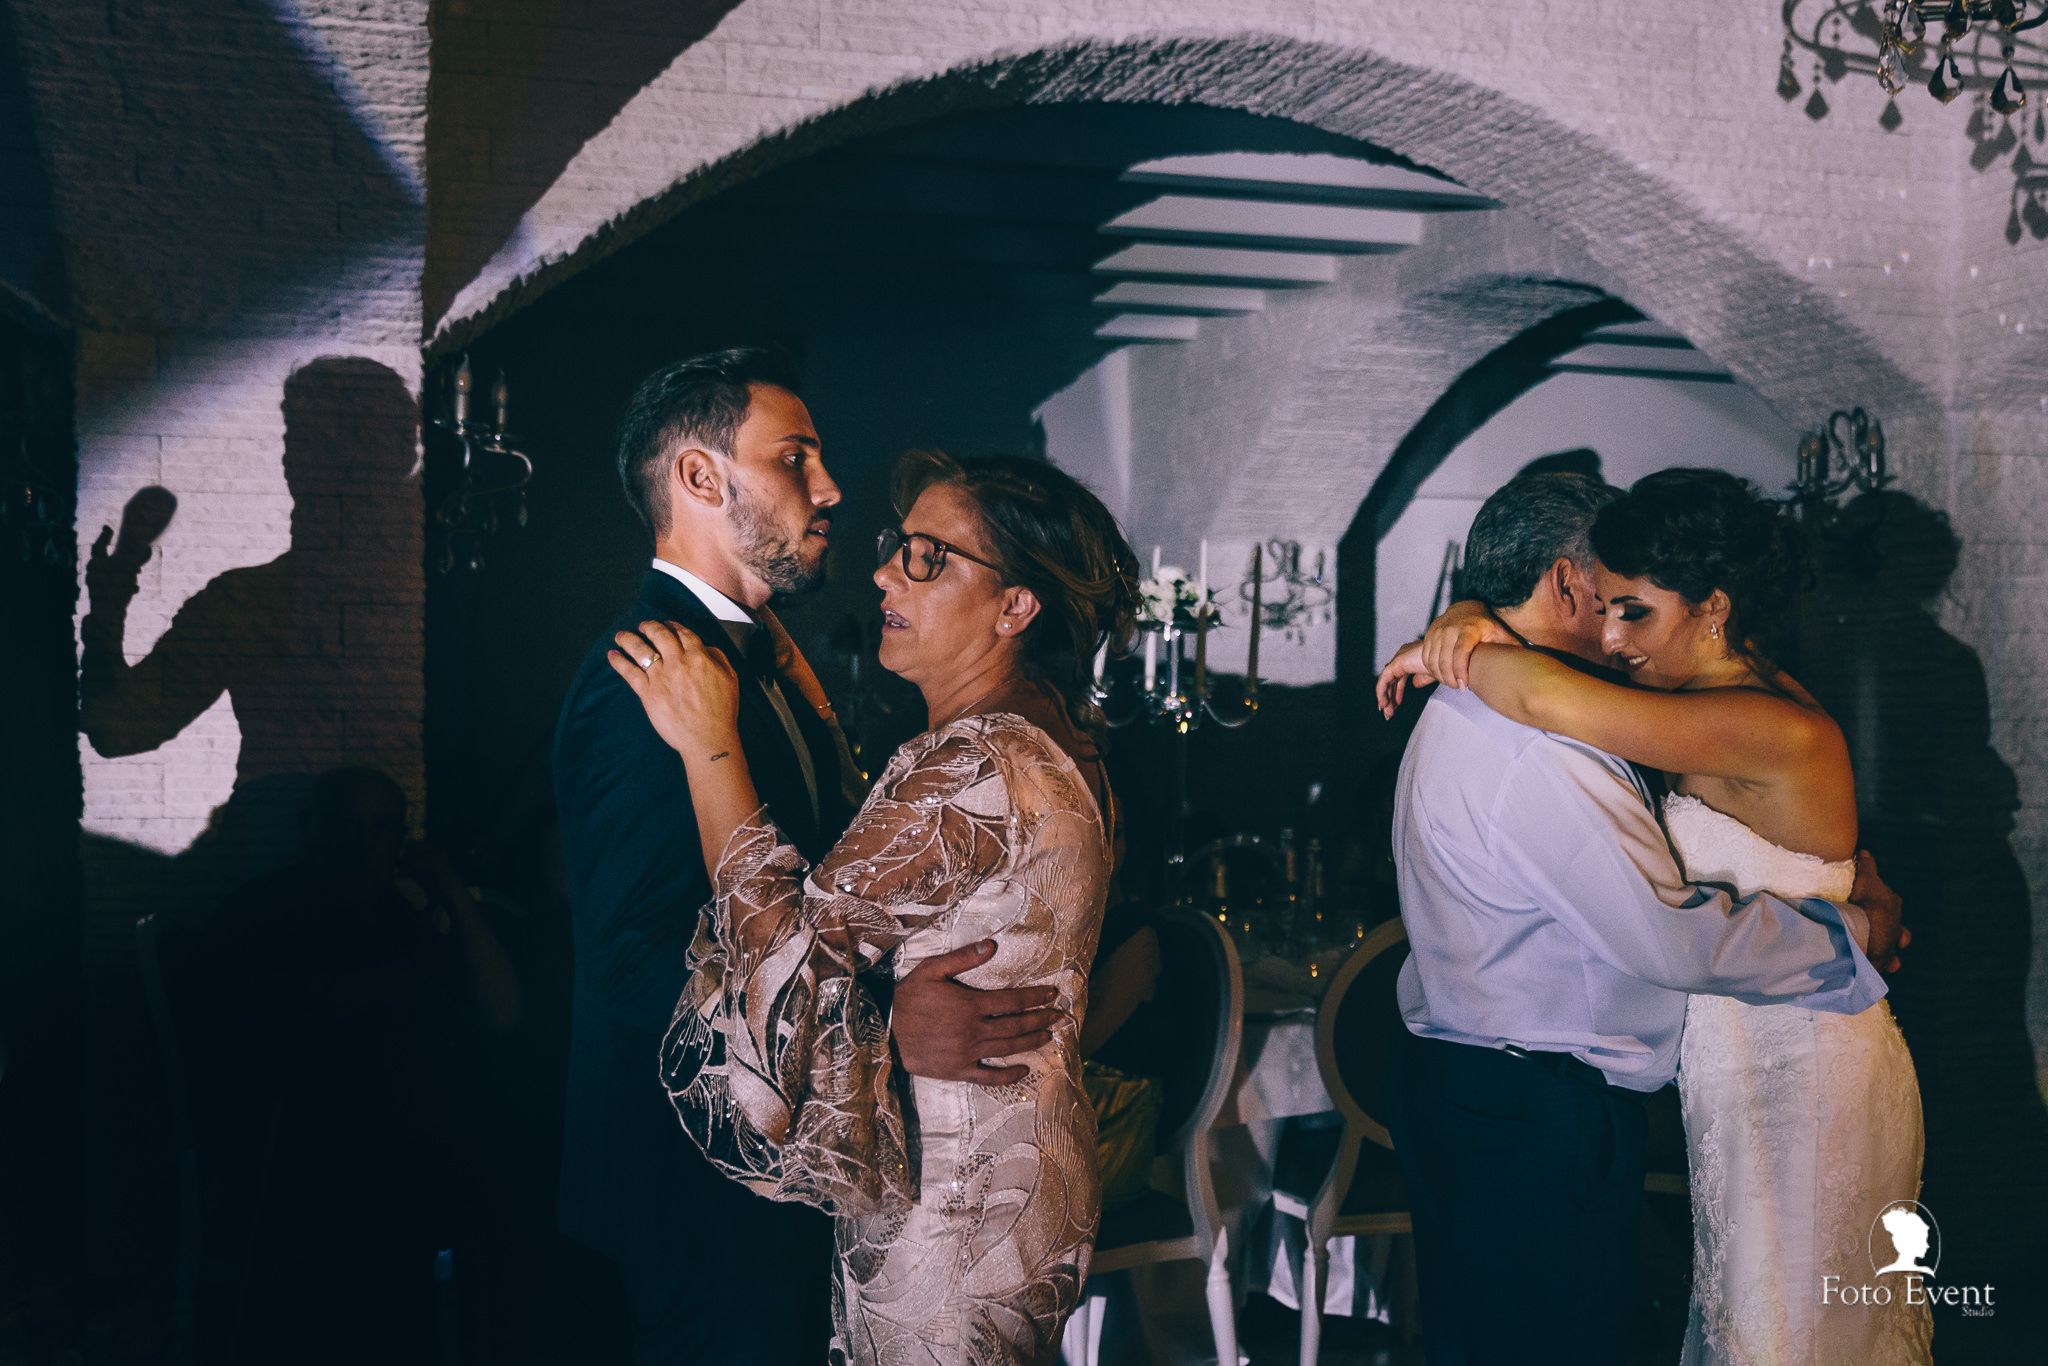 056-2019-08-31-Matrimonio-Serena-e-Saverio-Tarantino-5DE-1707